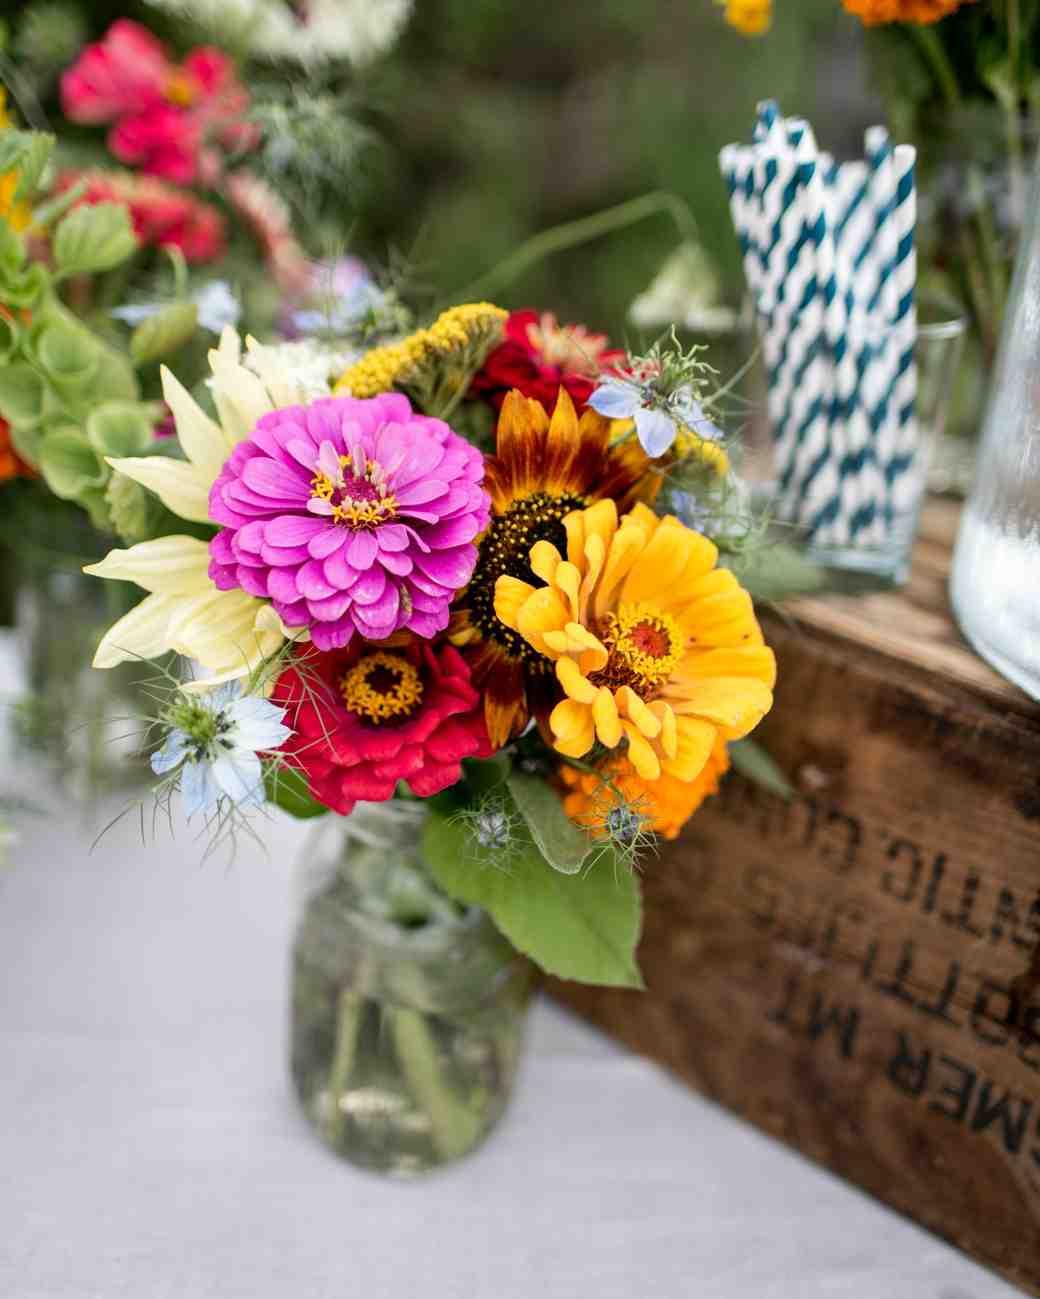 Bright dahlia and sunflower wedding centerpieces